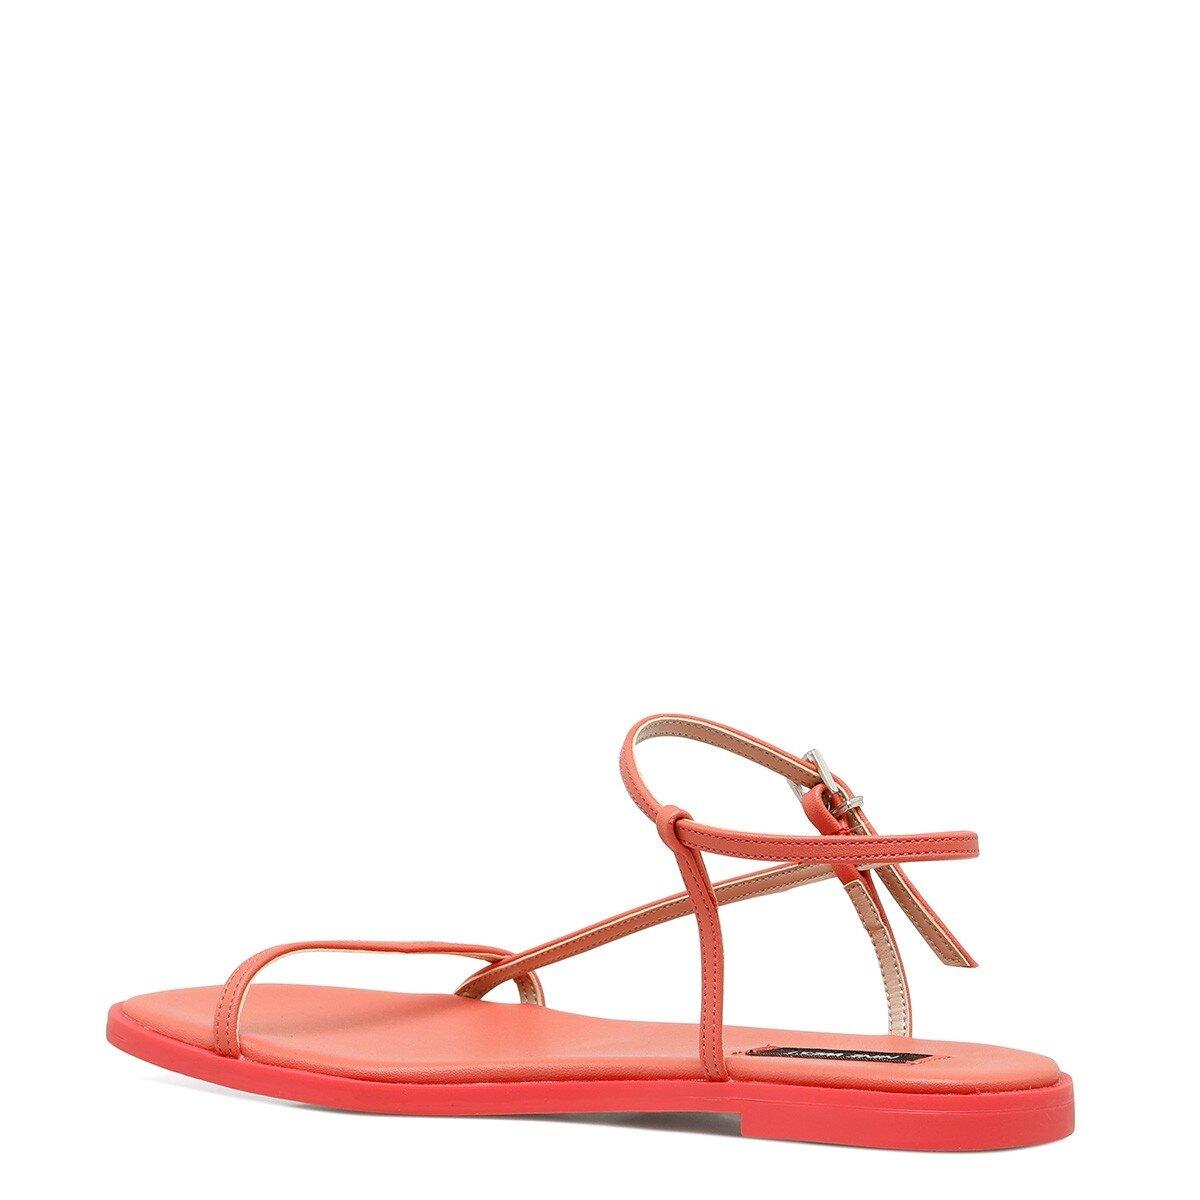 MELSA2 1FX Fuşya Kadın Sandalet